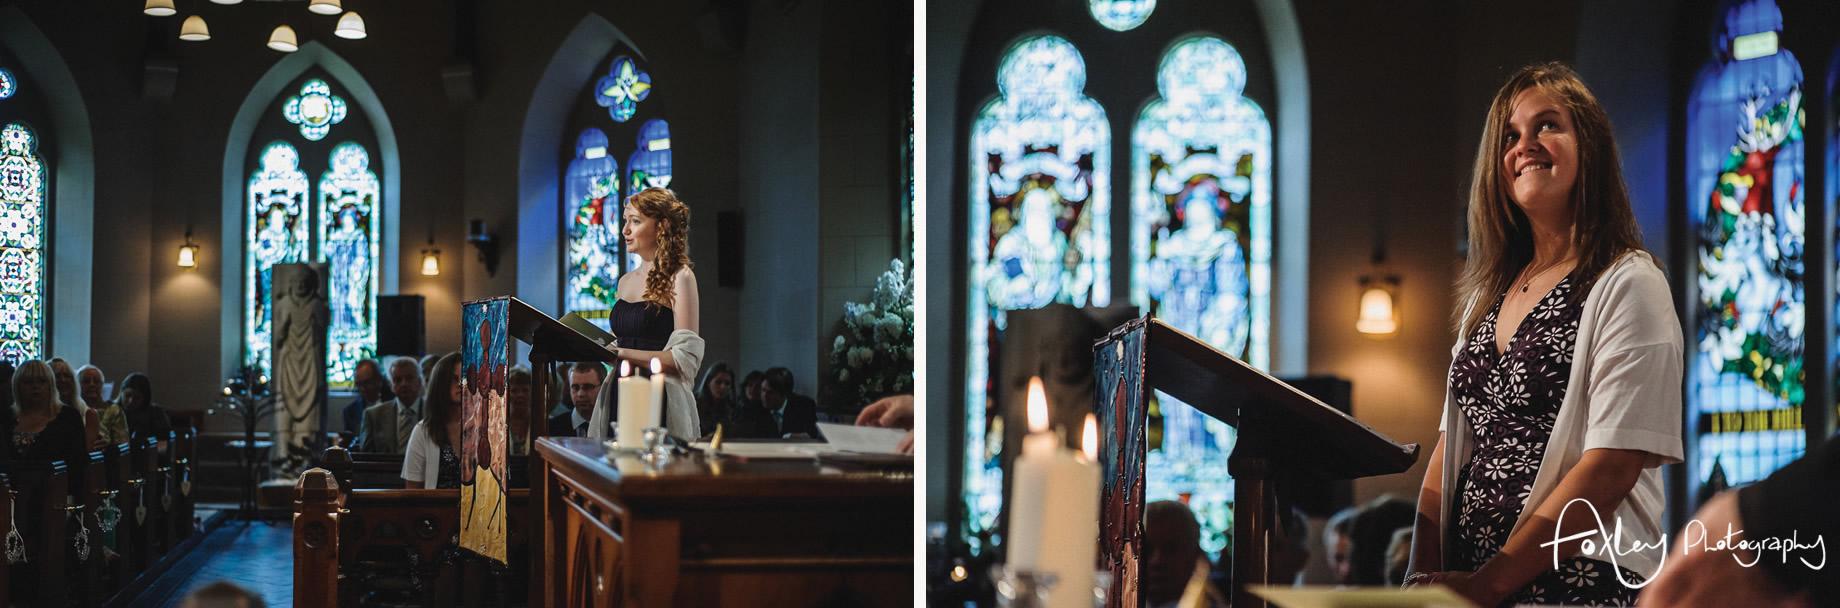 Alys-And-Davids-Wedding-Loch-Lomond-092